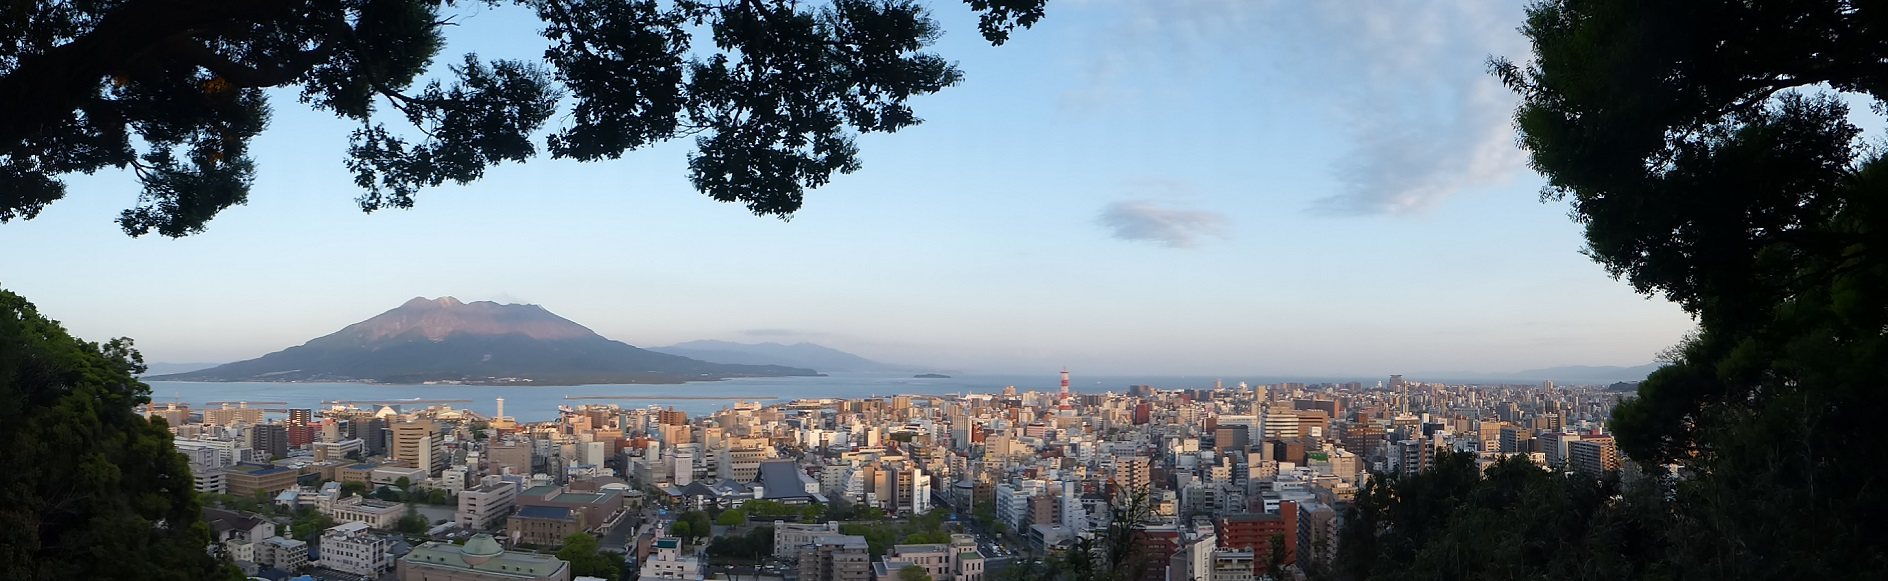 Ausblick über Kagoshima auf den aktiven Vulkan Sakurashima...